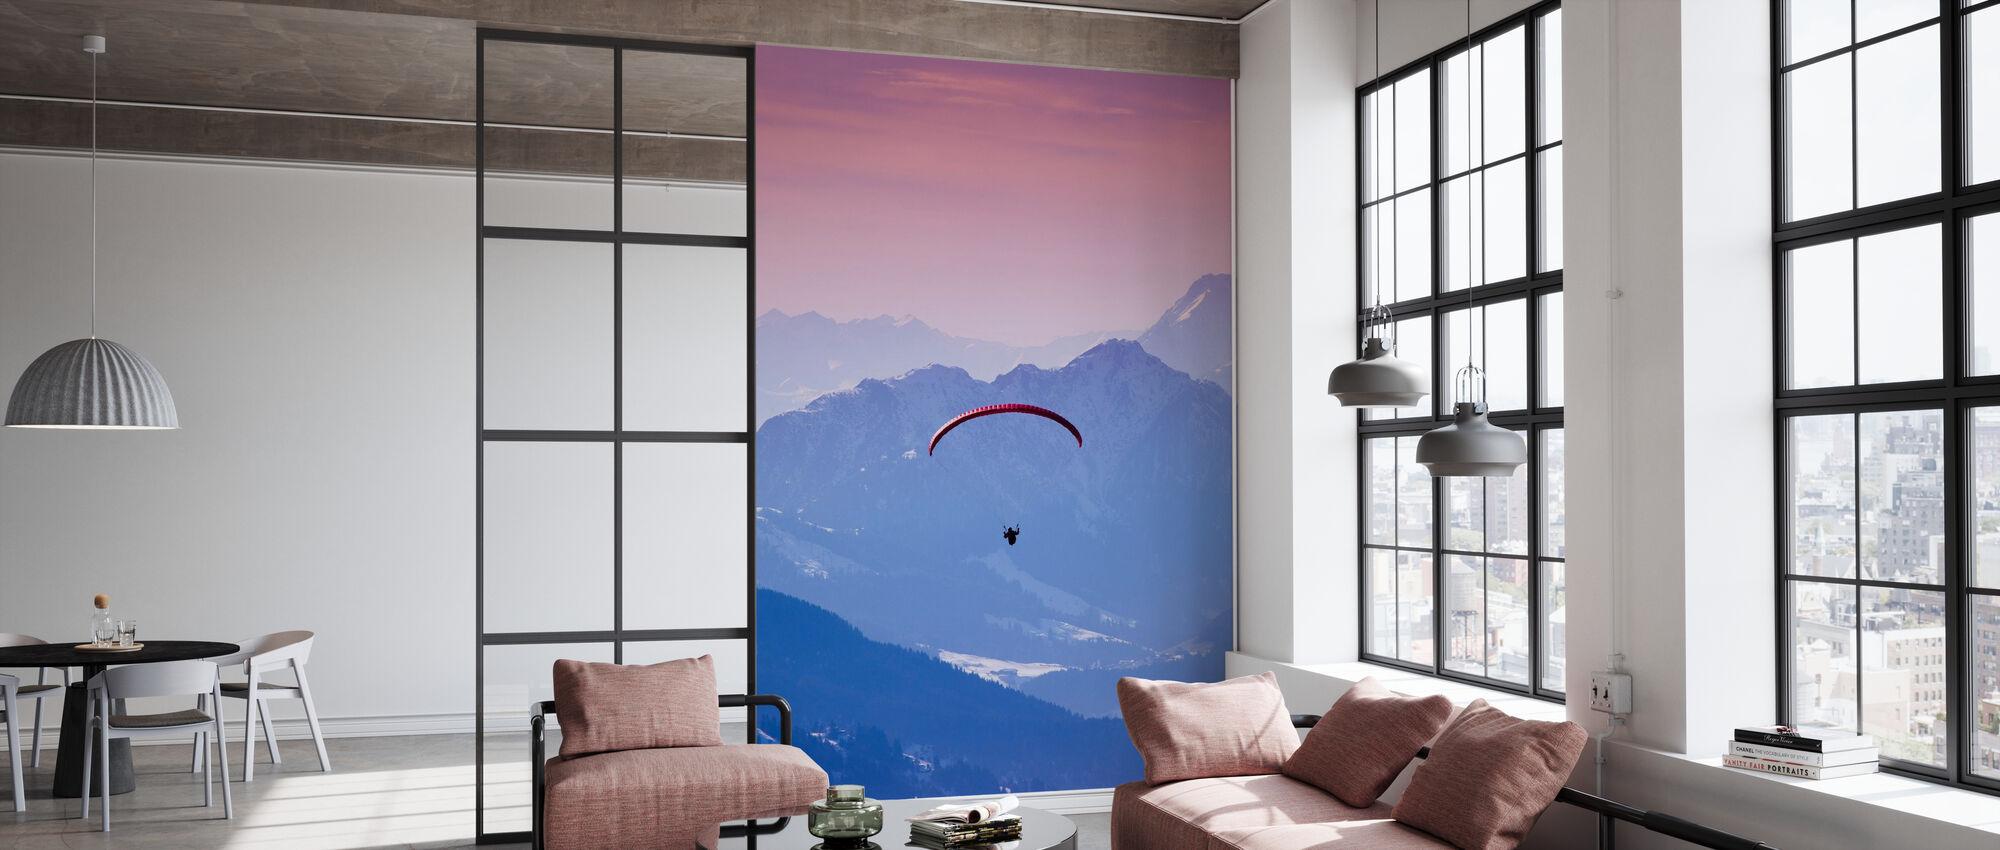 Kite in Hopfgarten, Austria - Wallpaper - Office